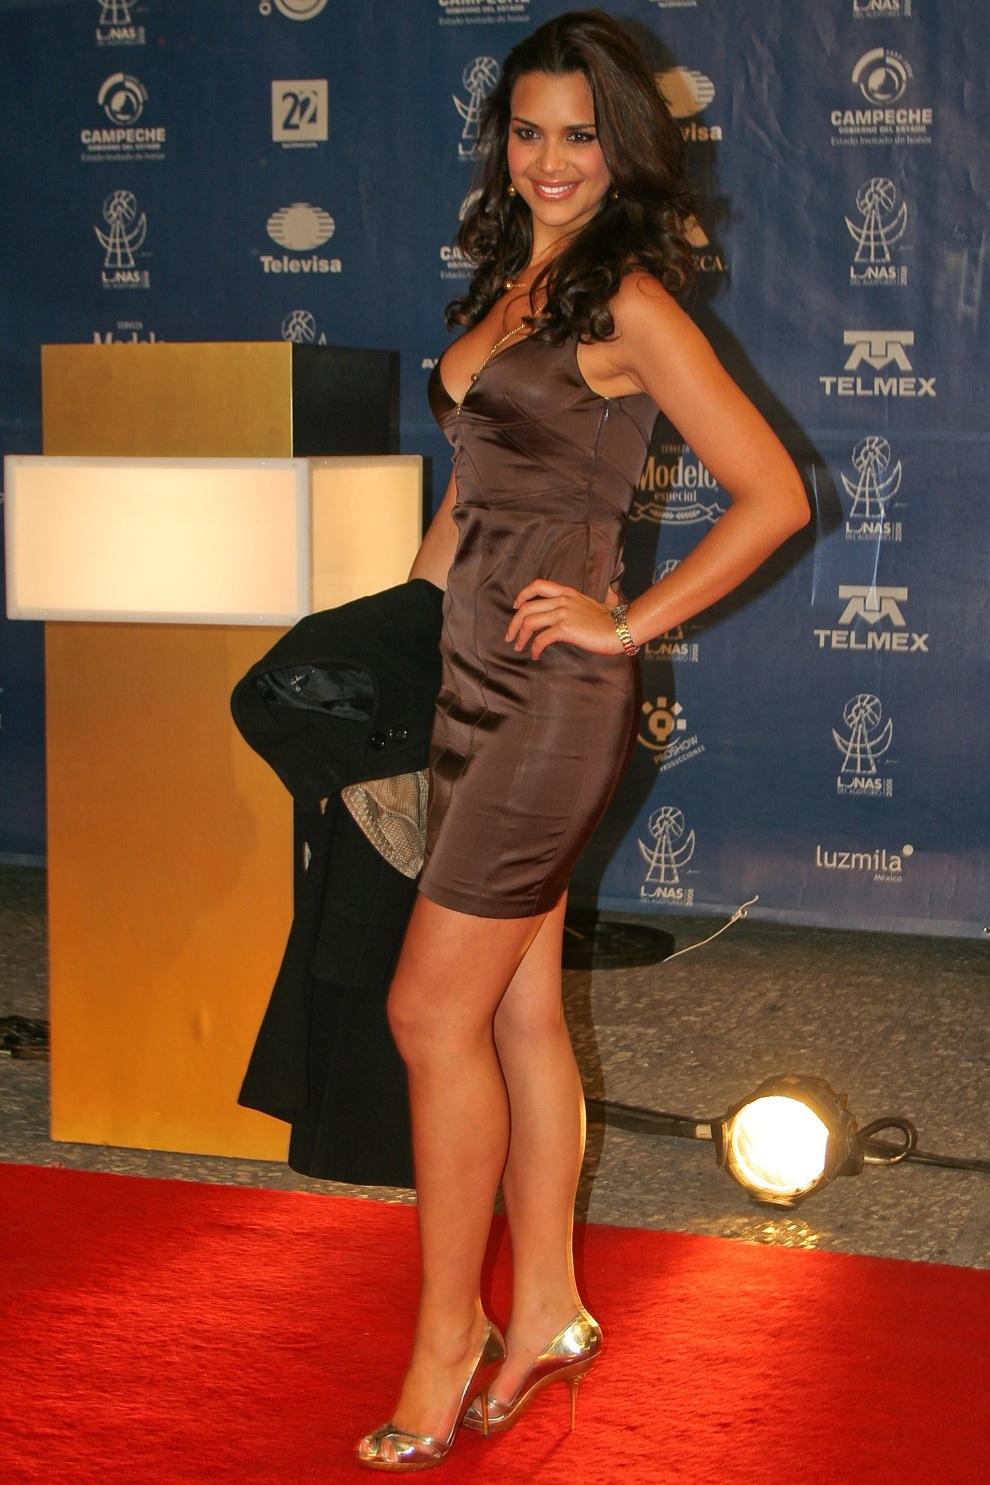 elisa najera, top 5 de miss universe 2008. Yeua7s9c